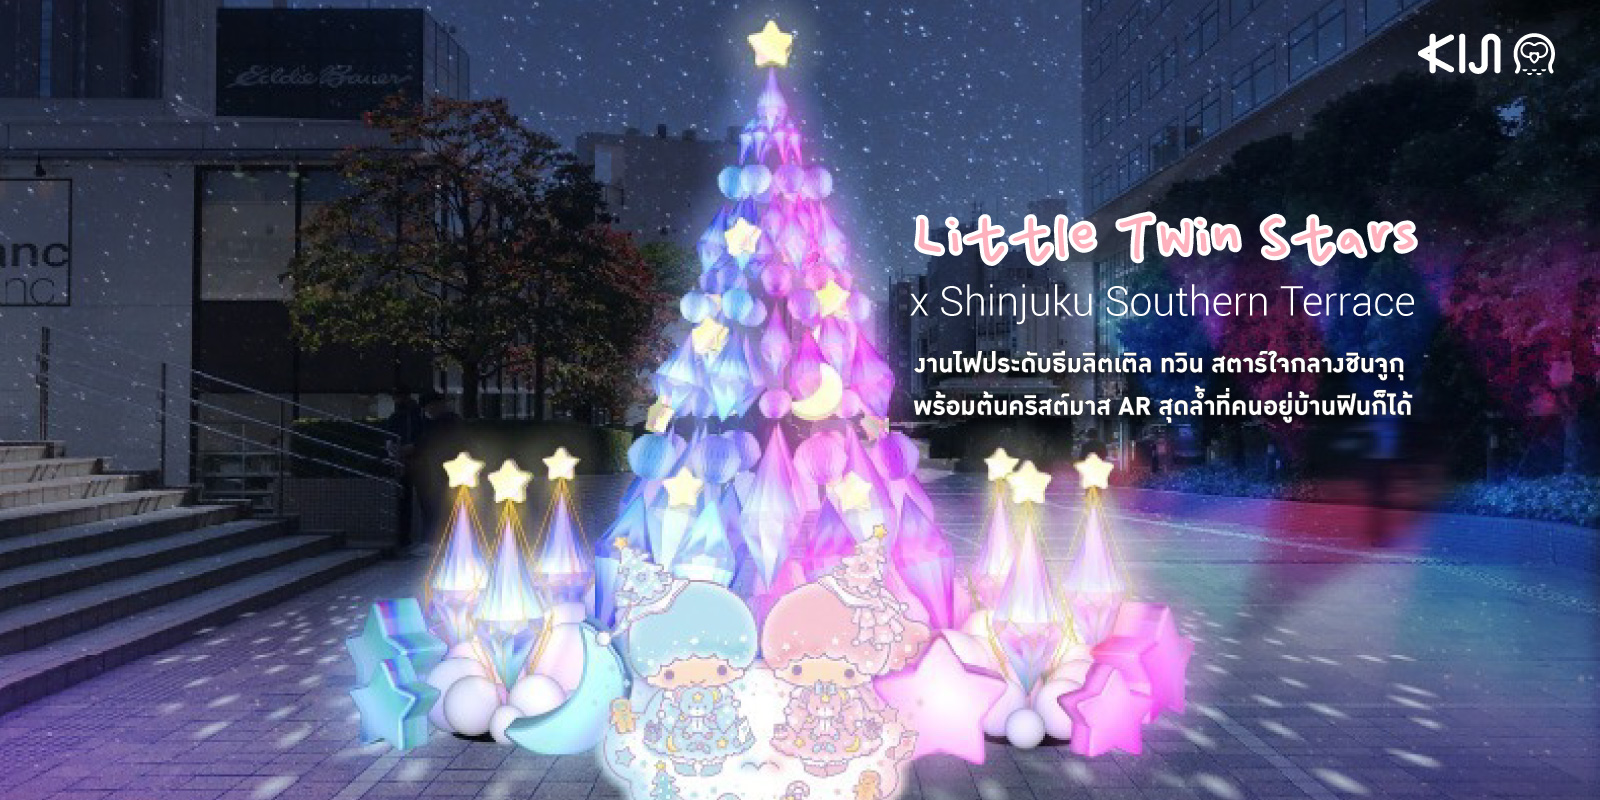 Little Twin Stars Shinjuku งานเทศกาลคริสต์มาสสุดล้ำที่ให้เราได้สนุกกับต้นคริสต์มาสแบบ AR